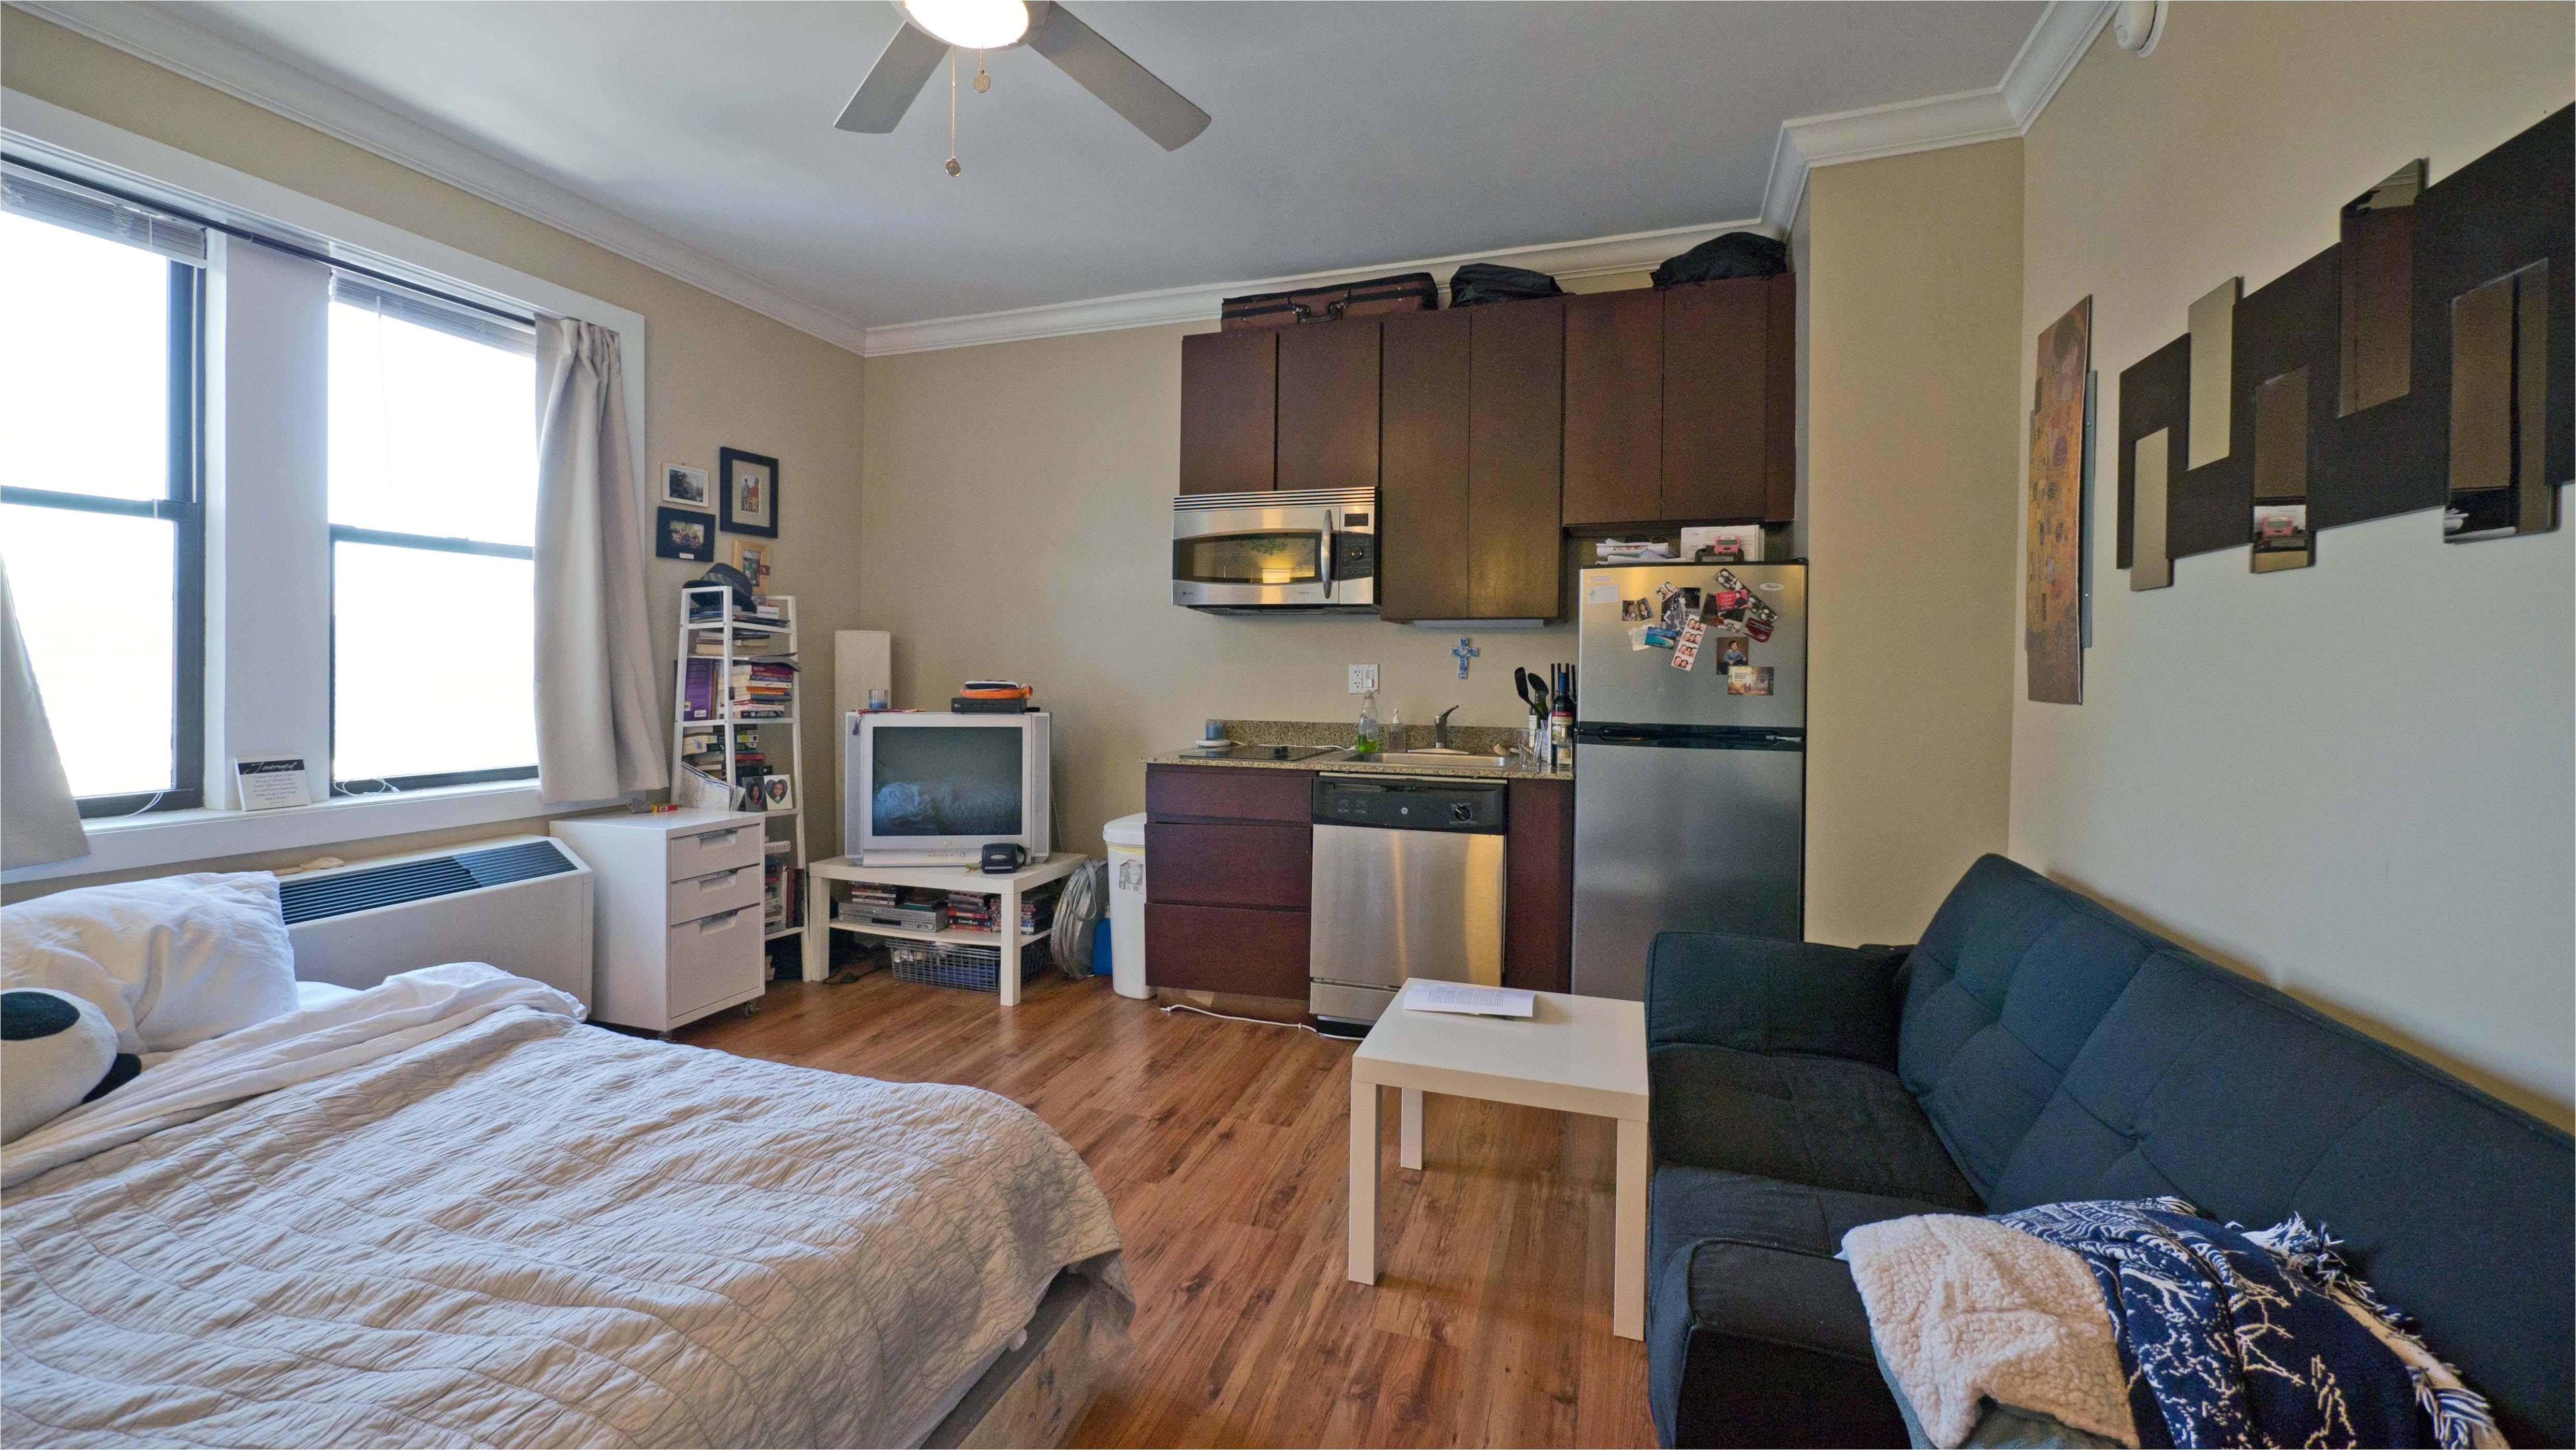 cheapest one bedroom apartment near me design studio apts for rent apartamentos en dallas tx cheap - Cheap Single Bedroom Apartments For Rent